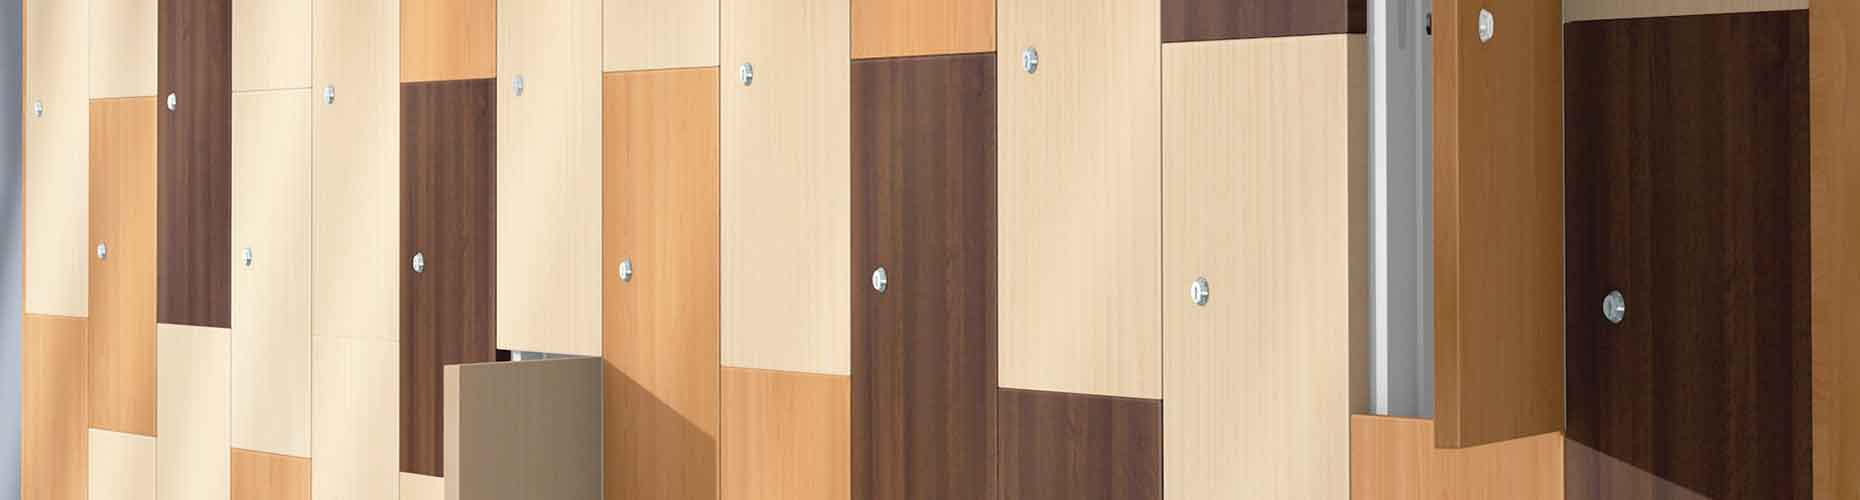 Woodgrain Laminate Door Lockers